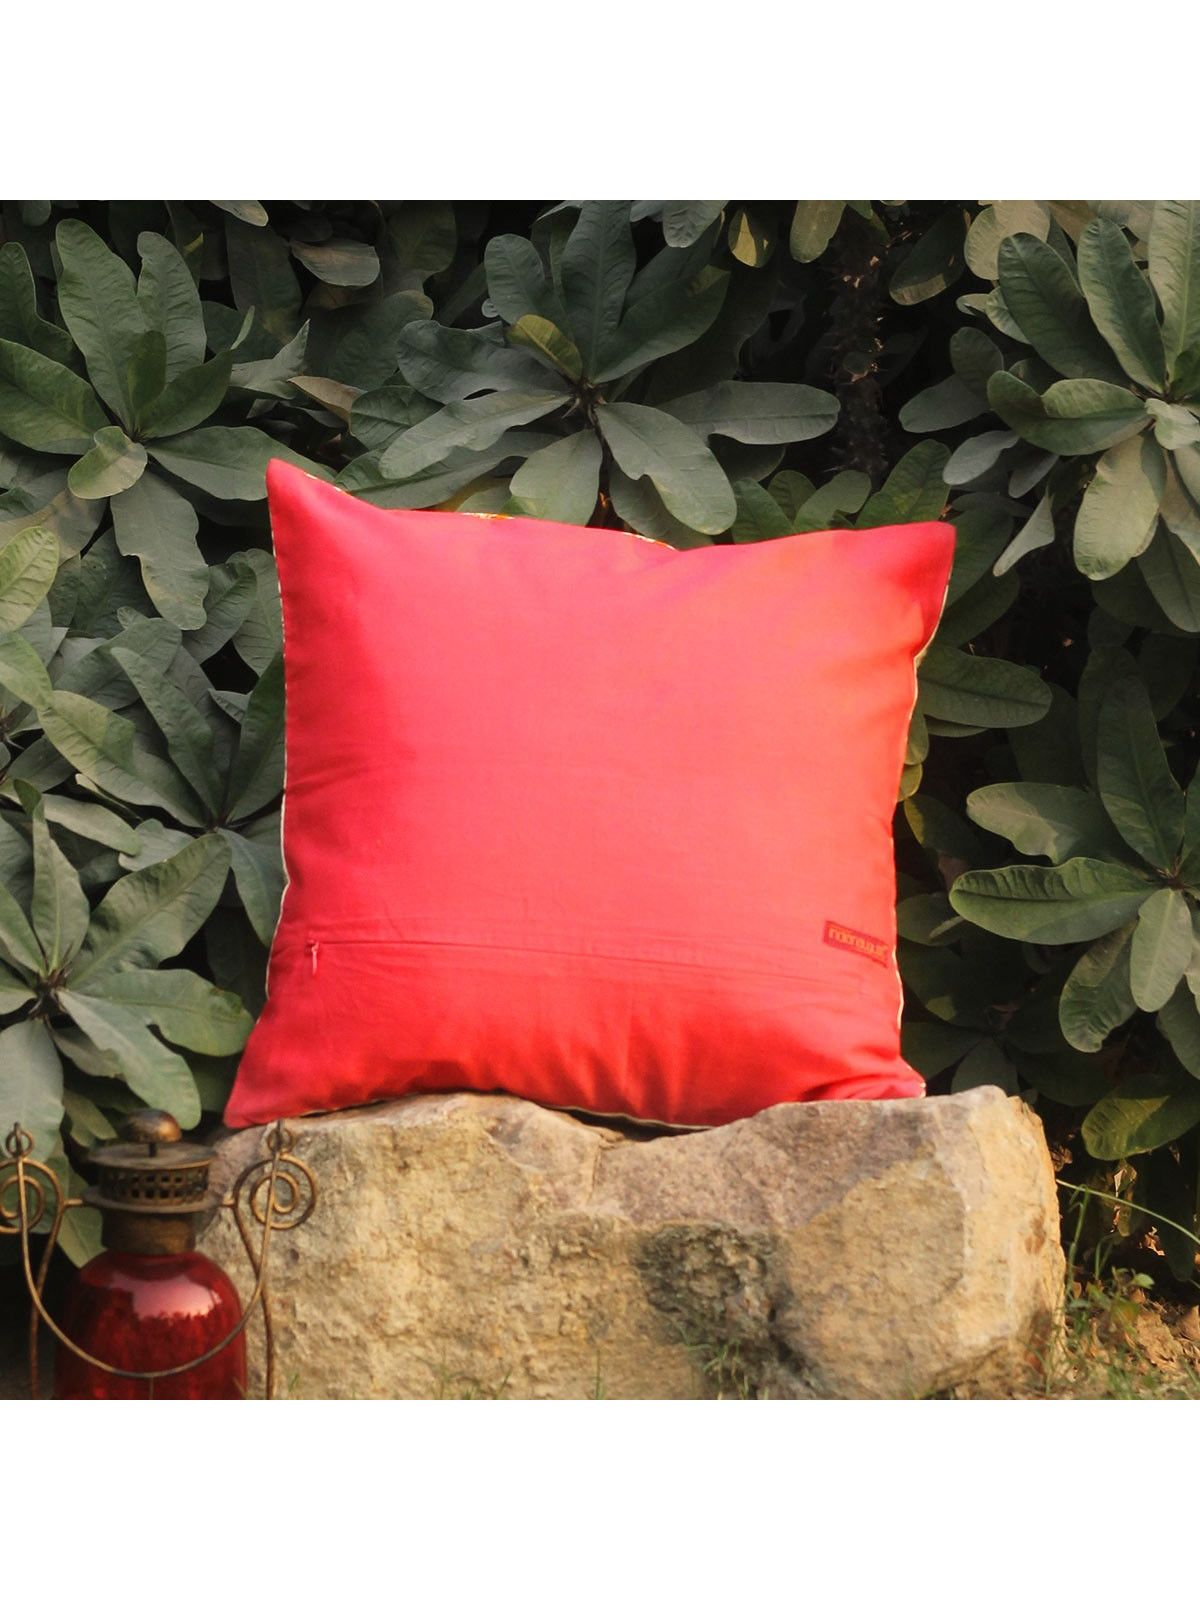 Rose Pink Lambeh Zari cushion